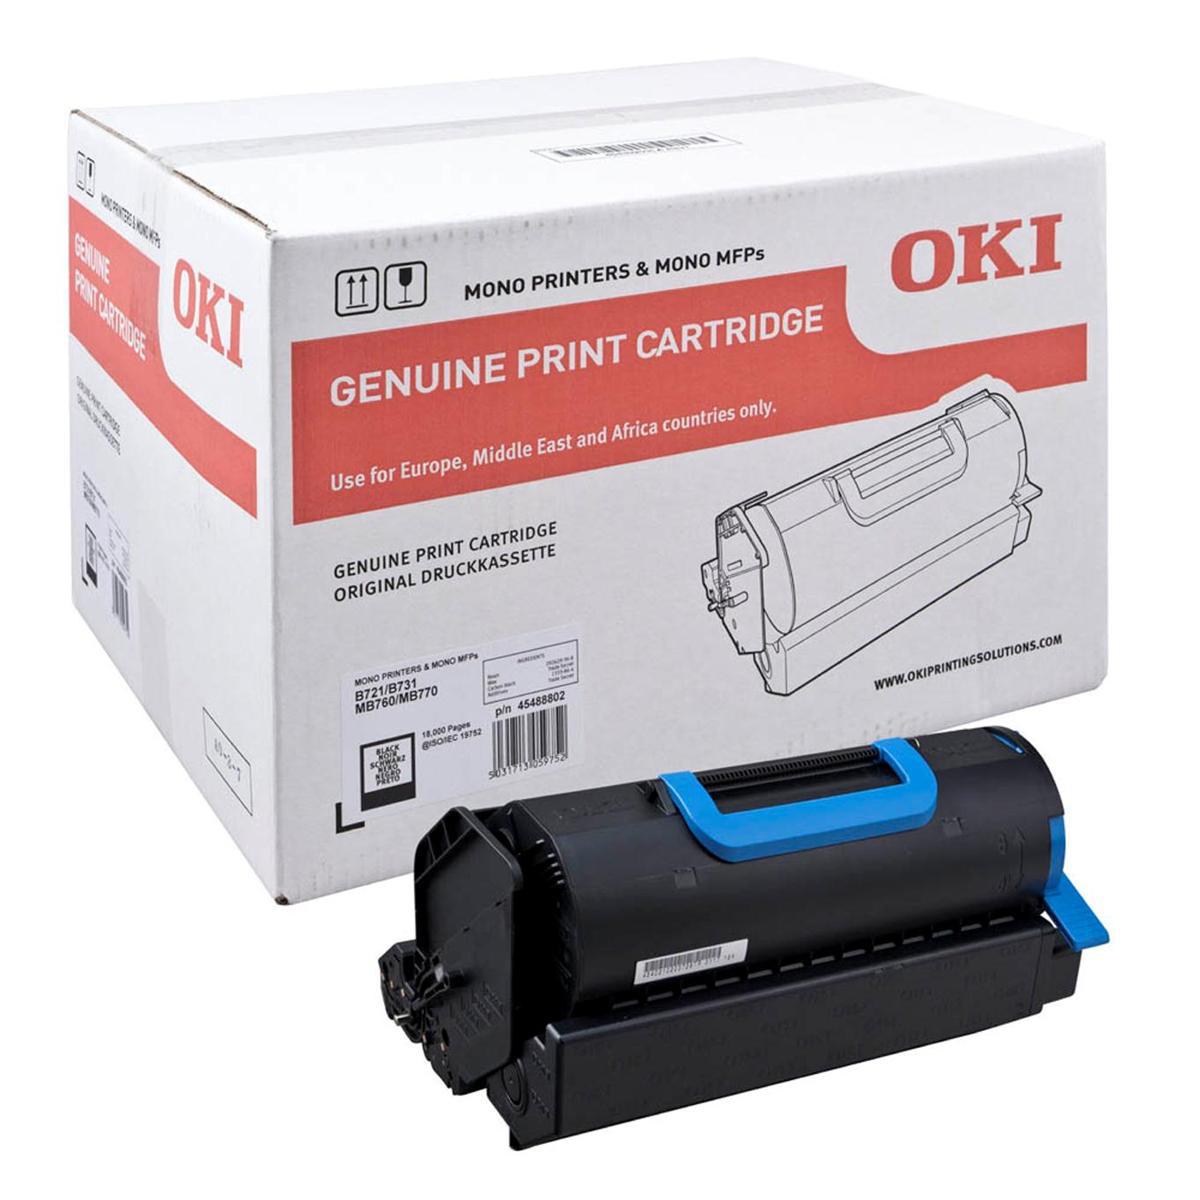 Laser Toner Cartridges OKI Laser Toner Cartridge Page Life 18000pp Black Ref 45488802